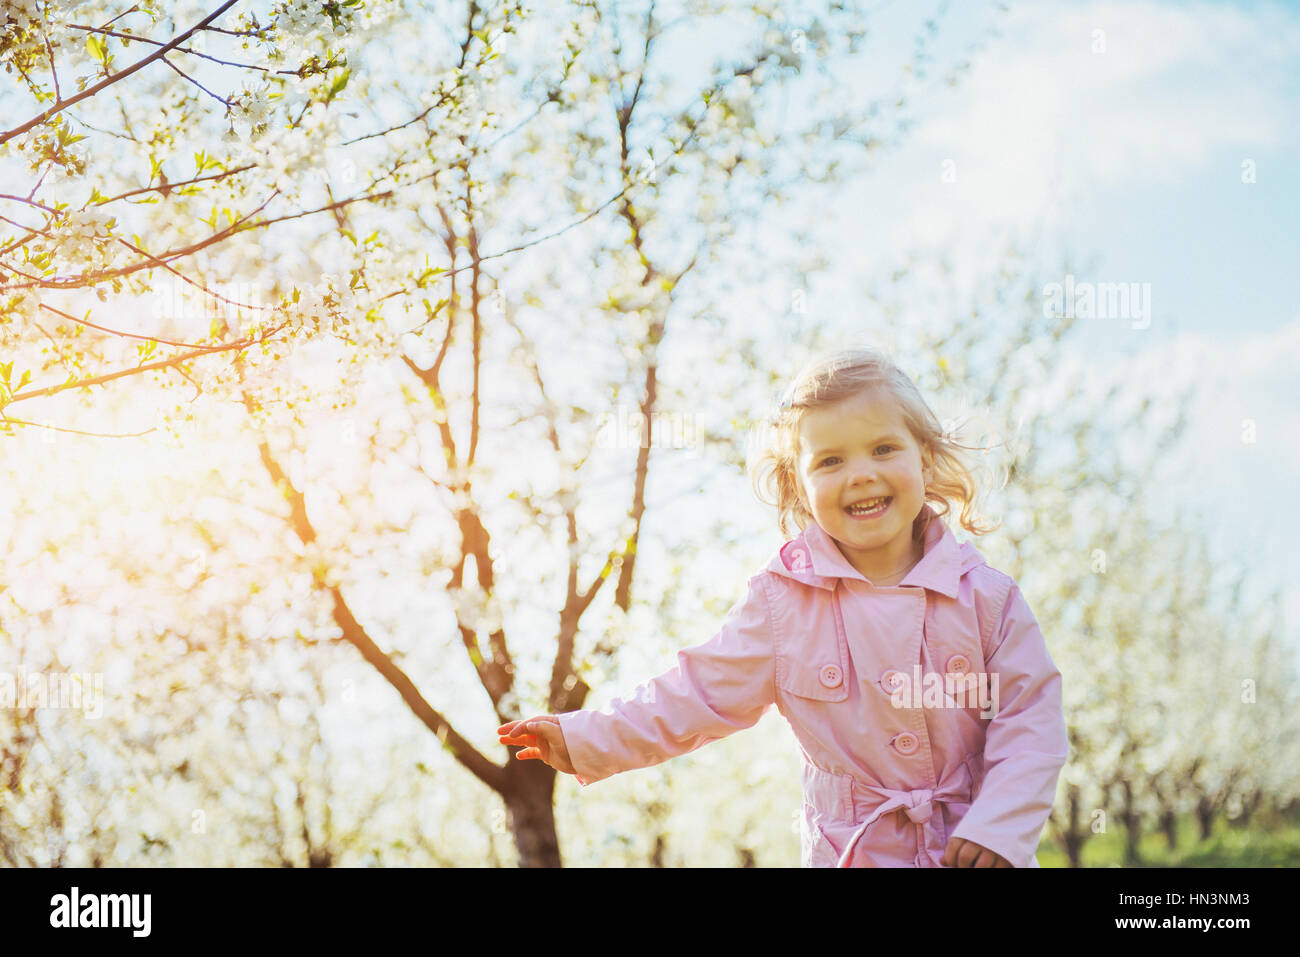 Kind im freien laufen blühenden Bäumen. Stockbild